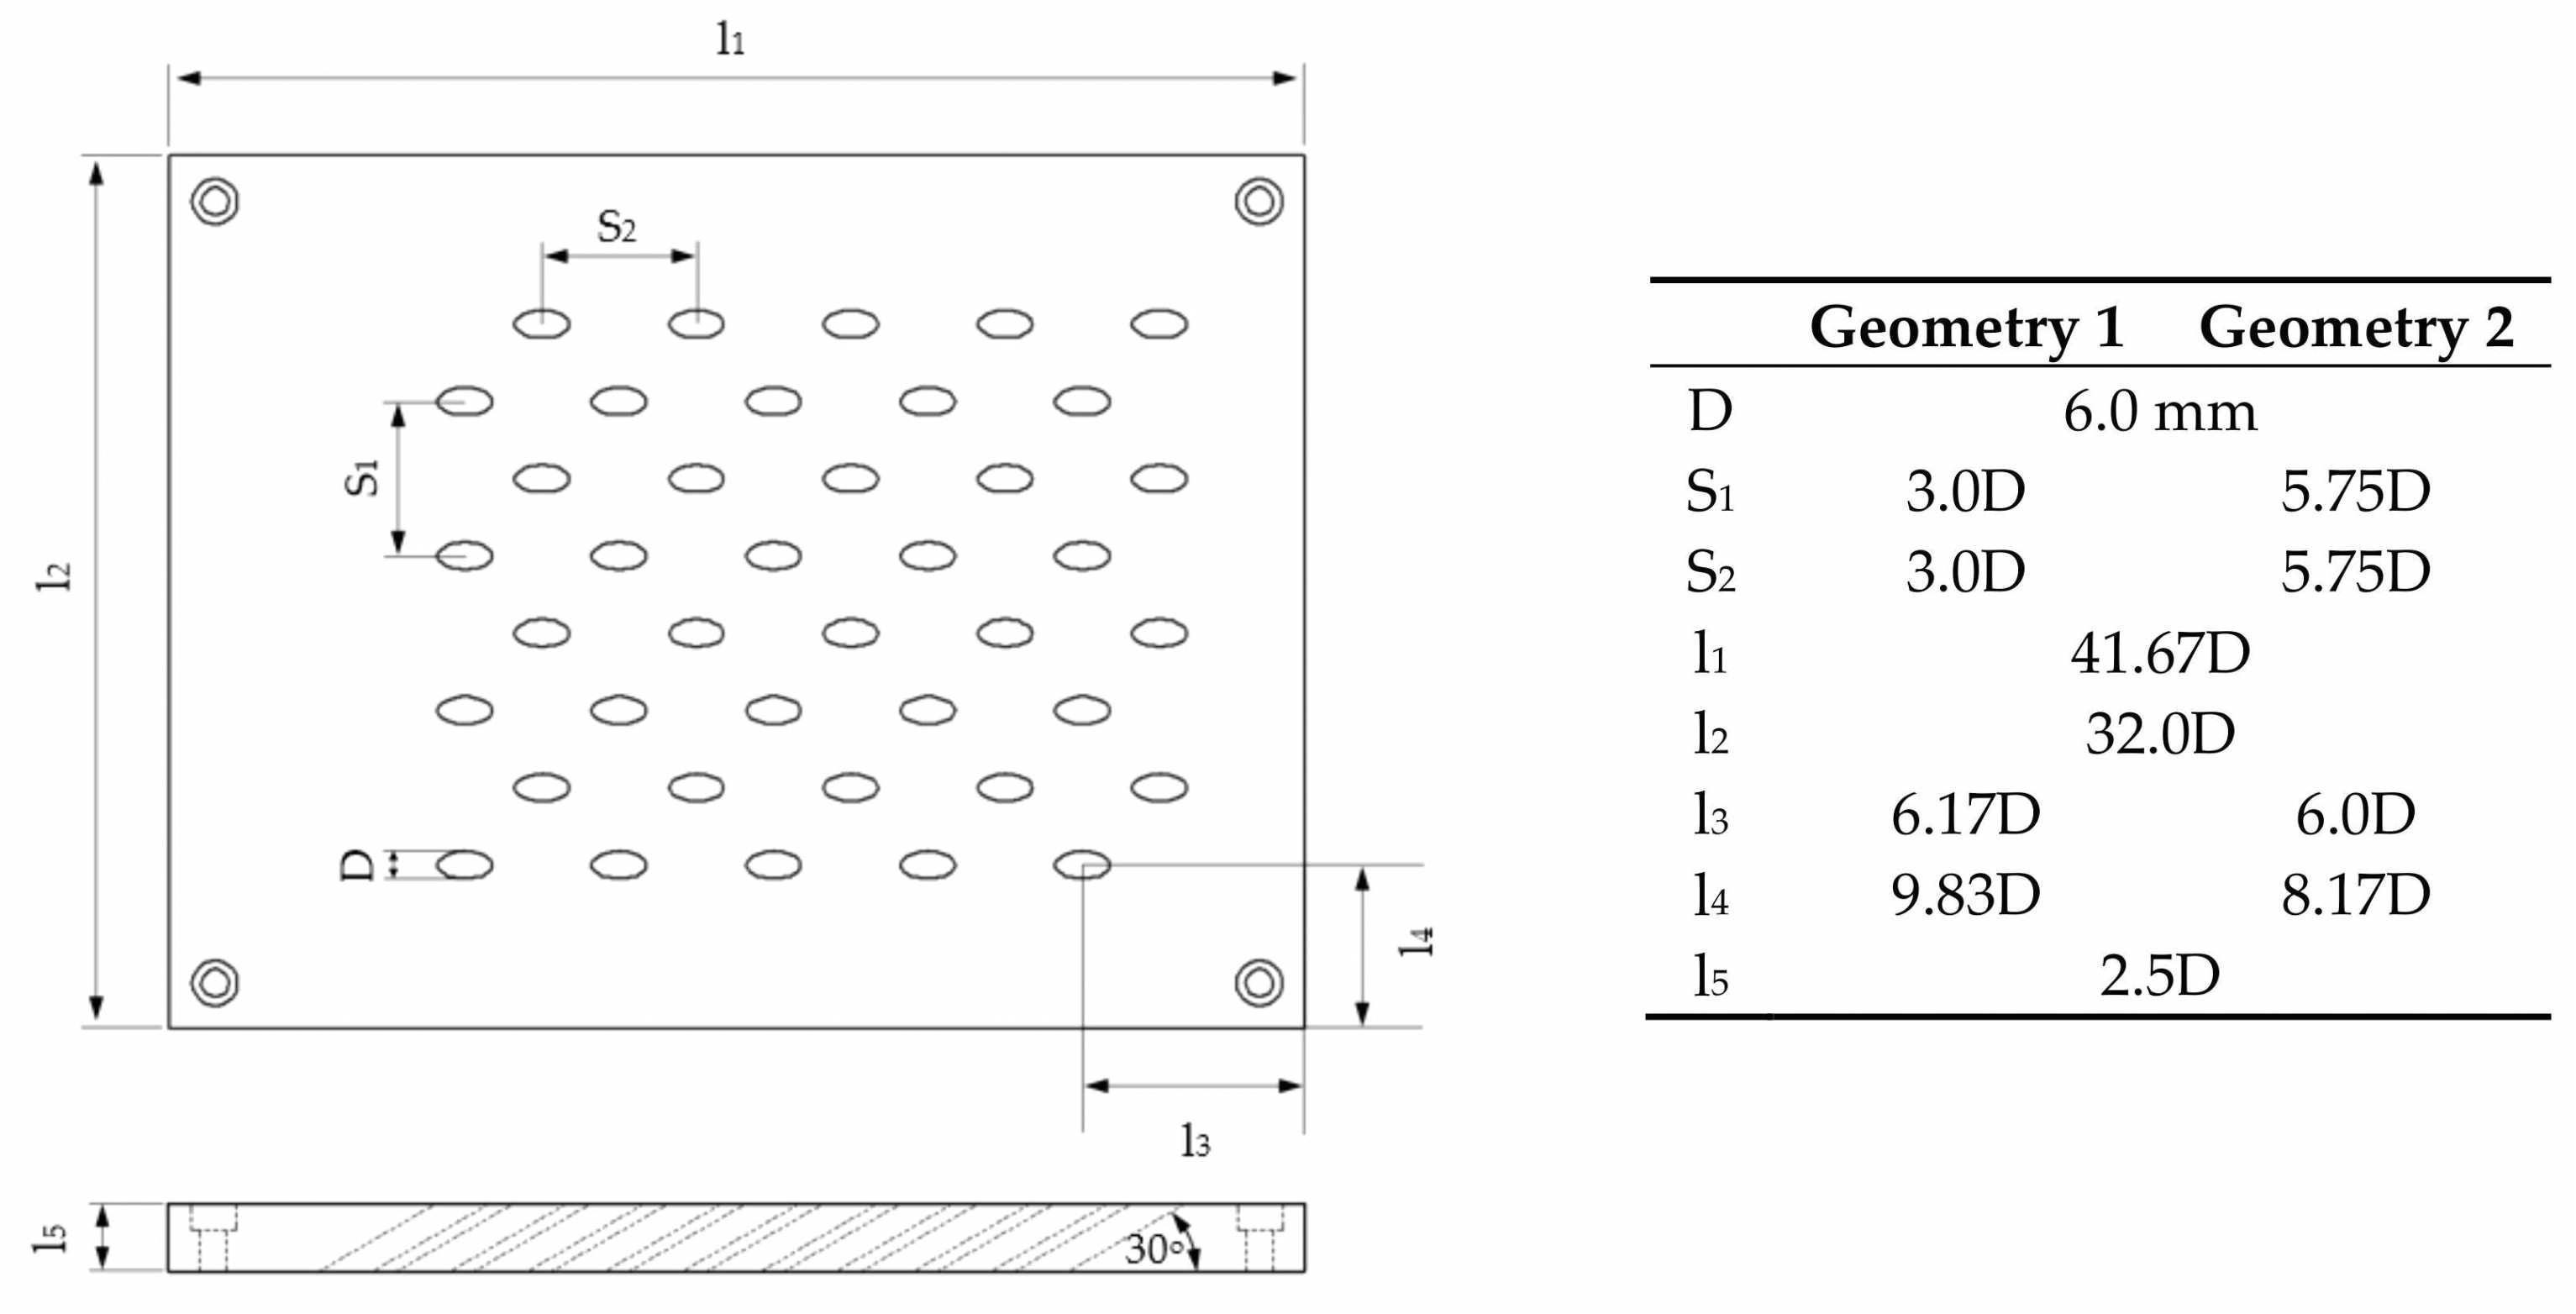 er online season 2 simple wiring diagram for database diagram tool online